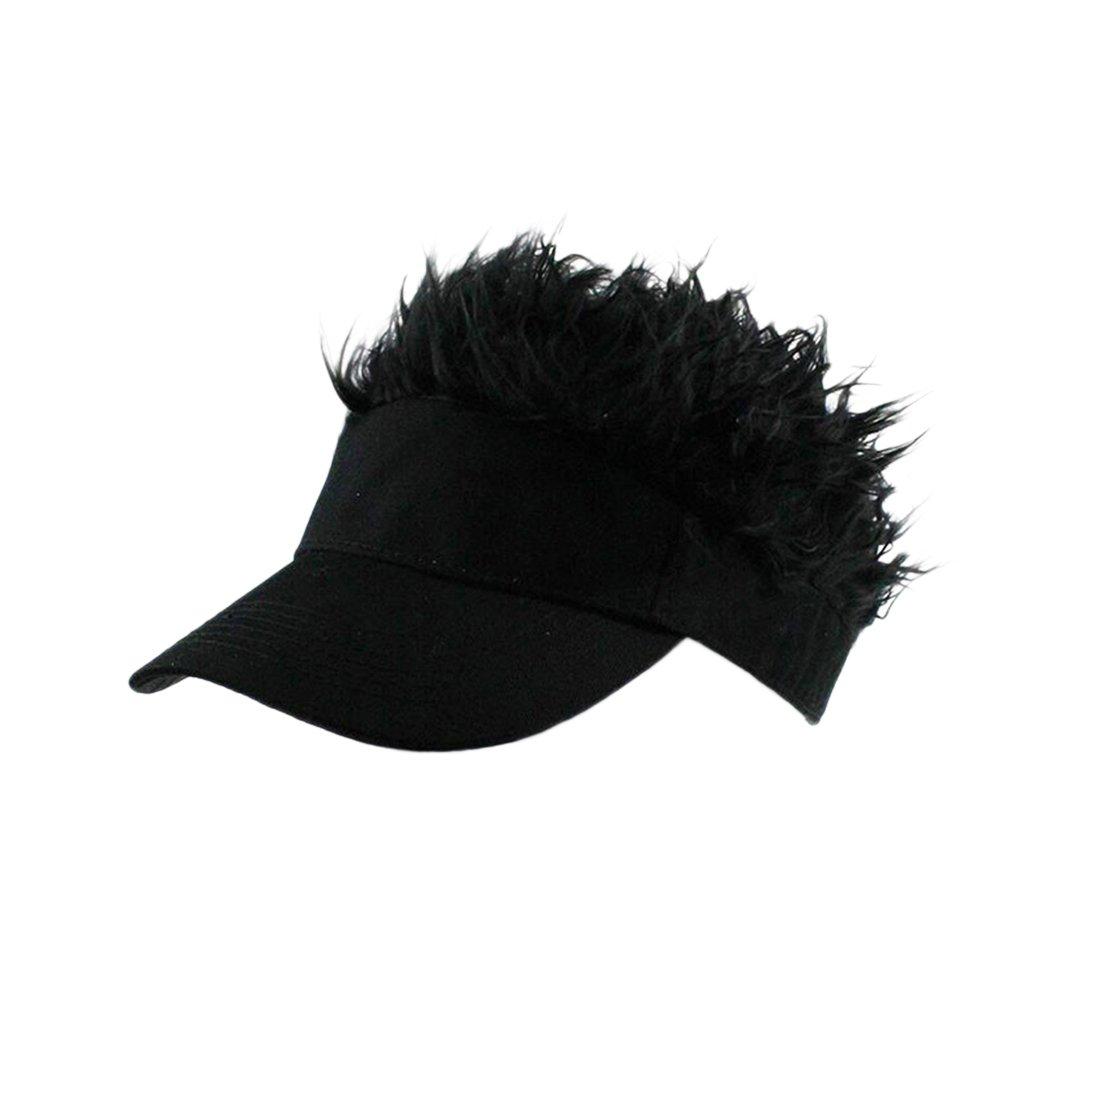 xzbailisha HAT ユニセックスアダルト B07CPR19Z3 One Size|カラー3 カラー3 One Size